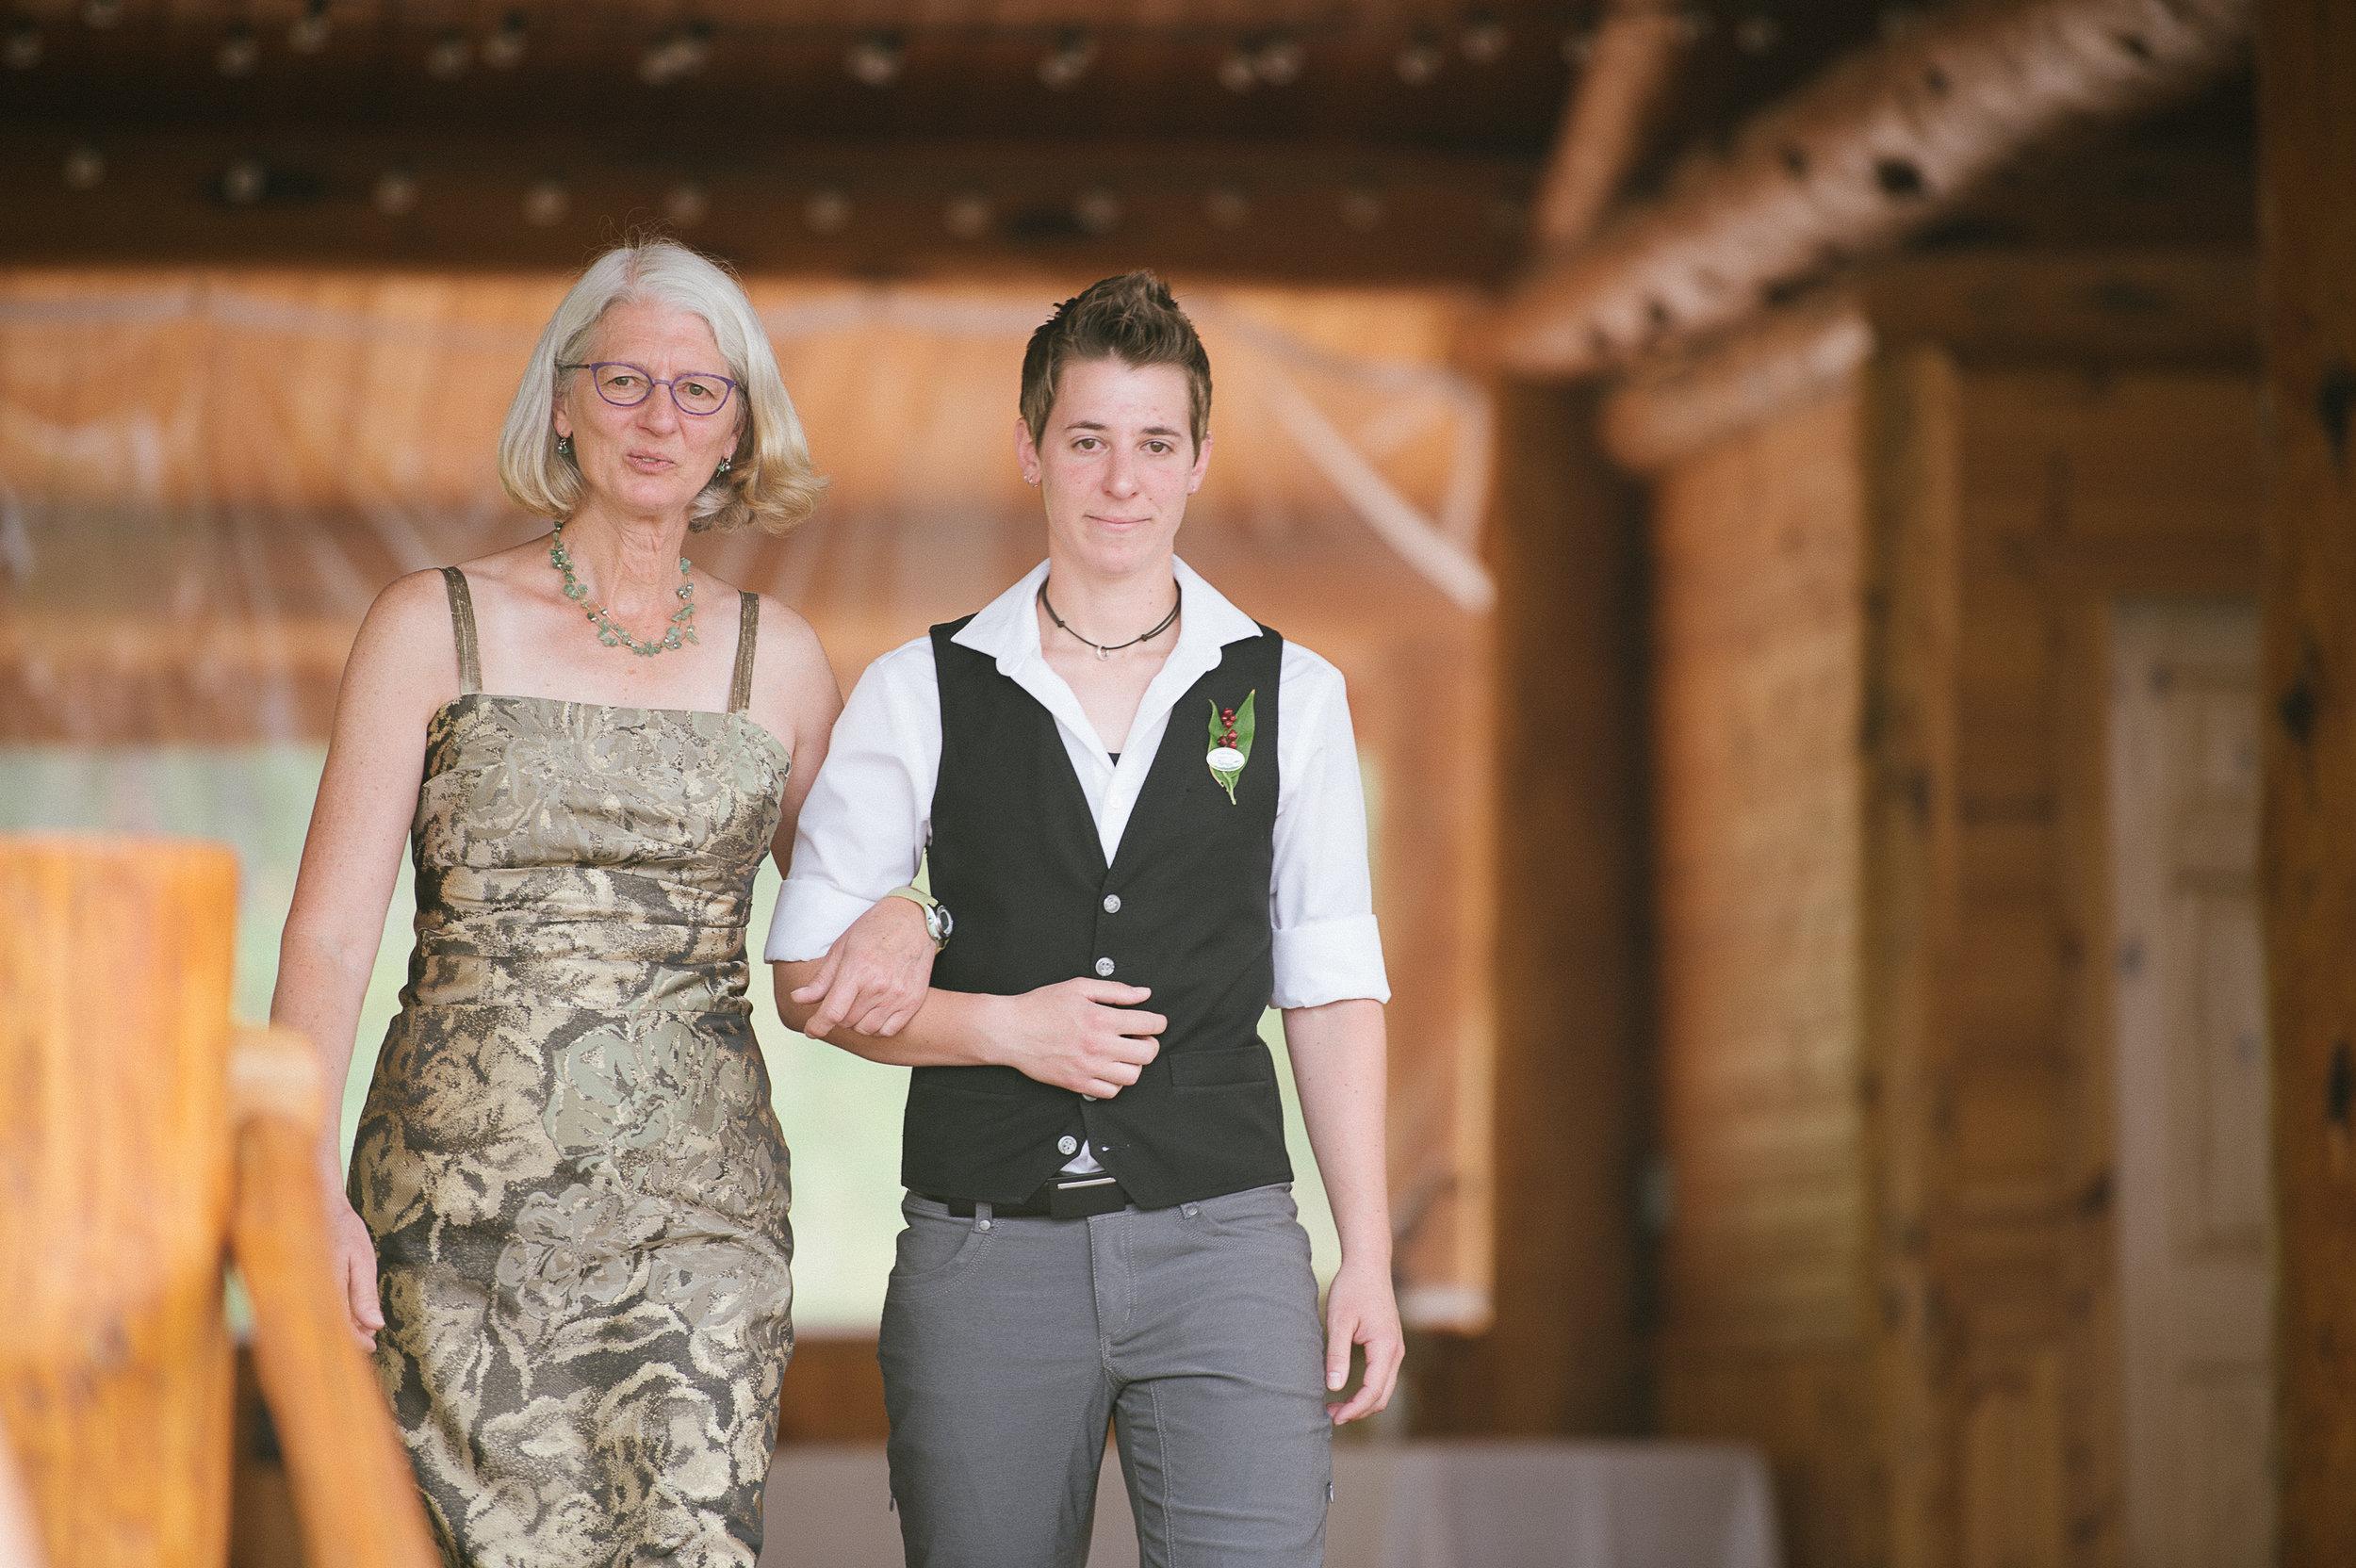 Glacier Montana Wedding_Elly Maurer + Frankie Dashiell Wedding_Beautiful Outdoor Wedding_Kelsey Lane Photography-4905.jpg